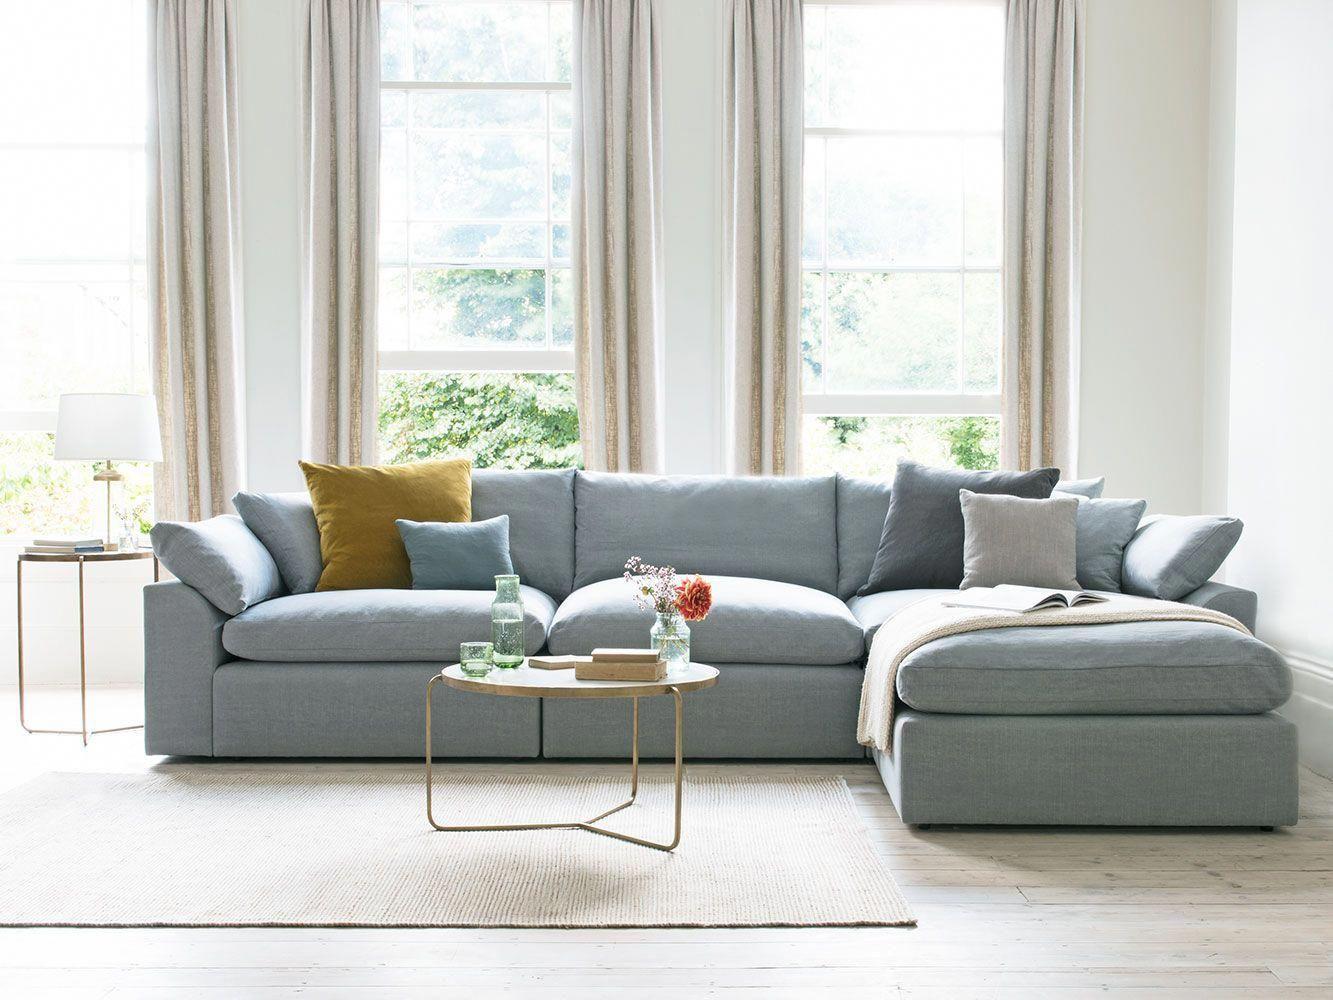 27 Unbelievable Corner Sofa Grey Corner Sofa Brown Furniturestore Furniturejati Cornersofa Chaise Sofa Modular Sofa Deep Sofa